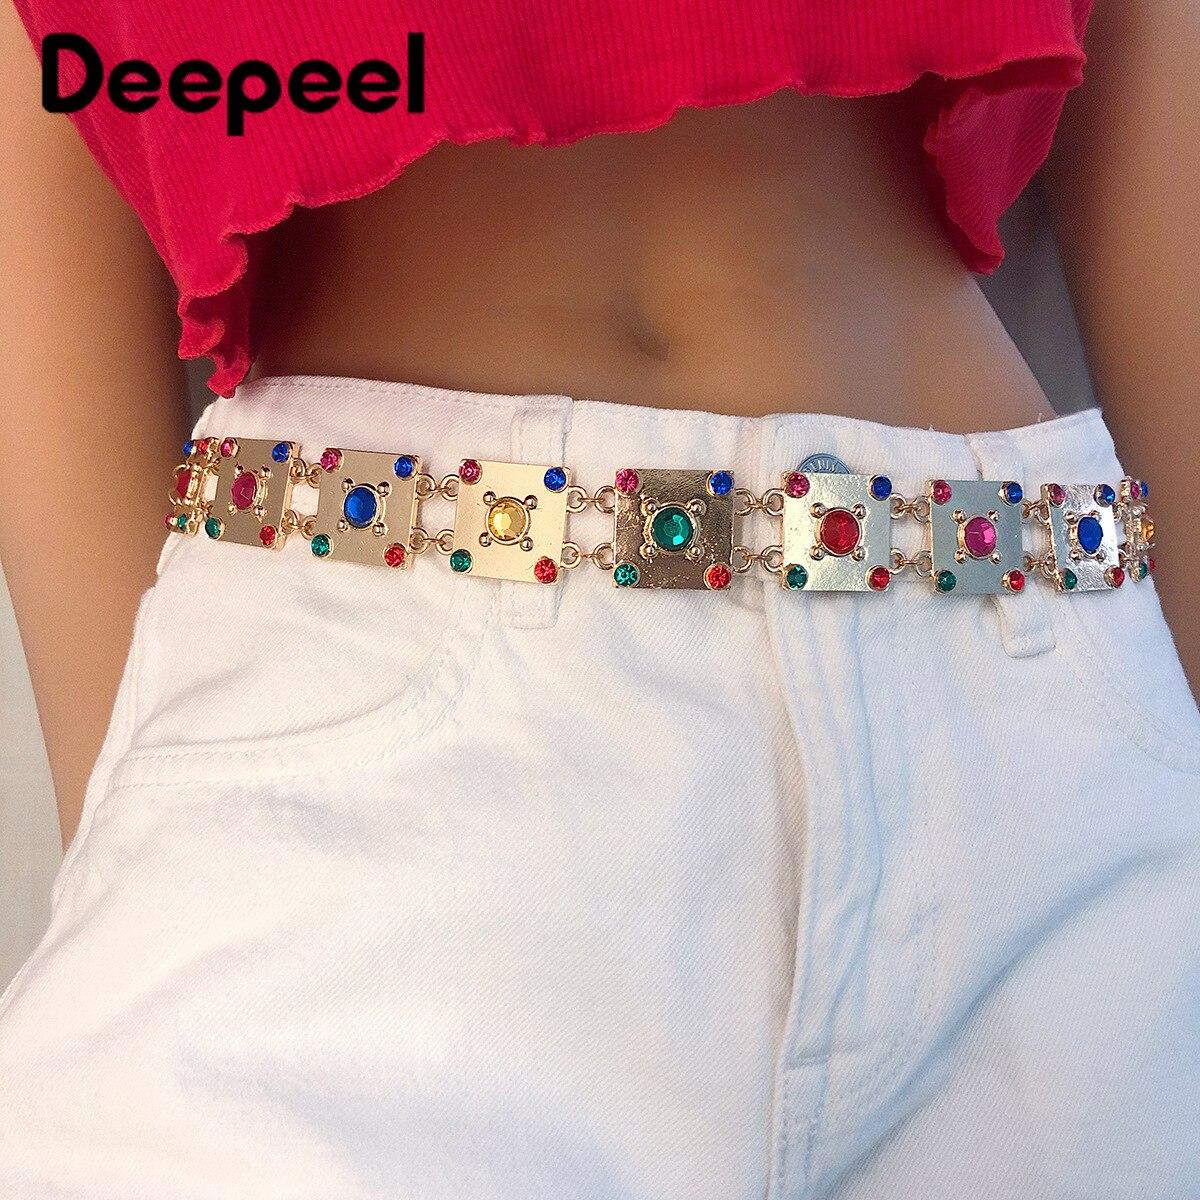 Deepeel 1pc 2.5cm*80-100cm Women Color Diamond Metal Cummerbunds Trendy Waist Chain Shinny Colorful Adjustable Girdle CB649